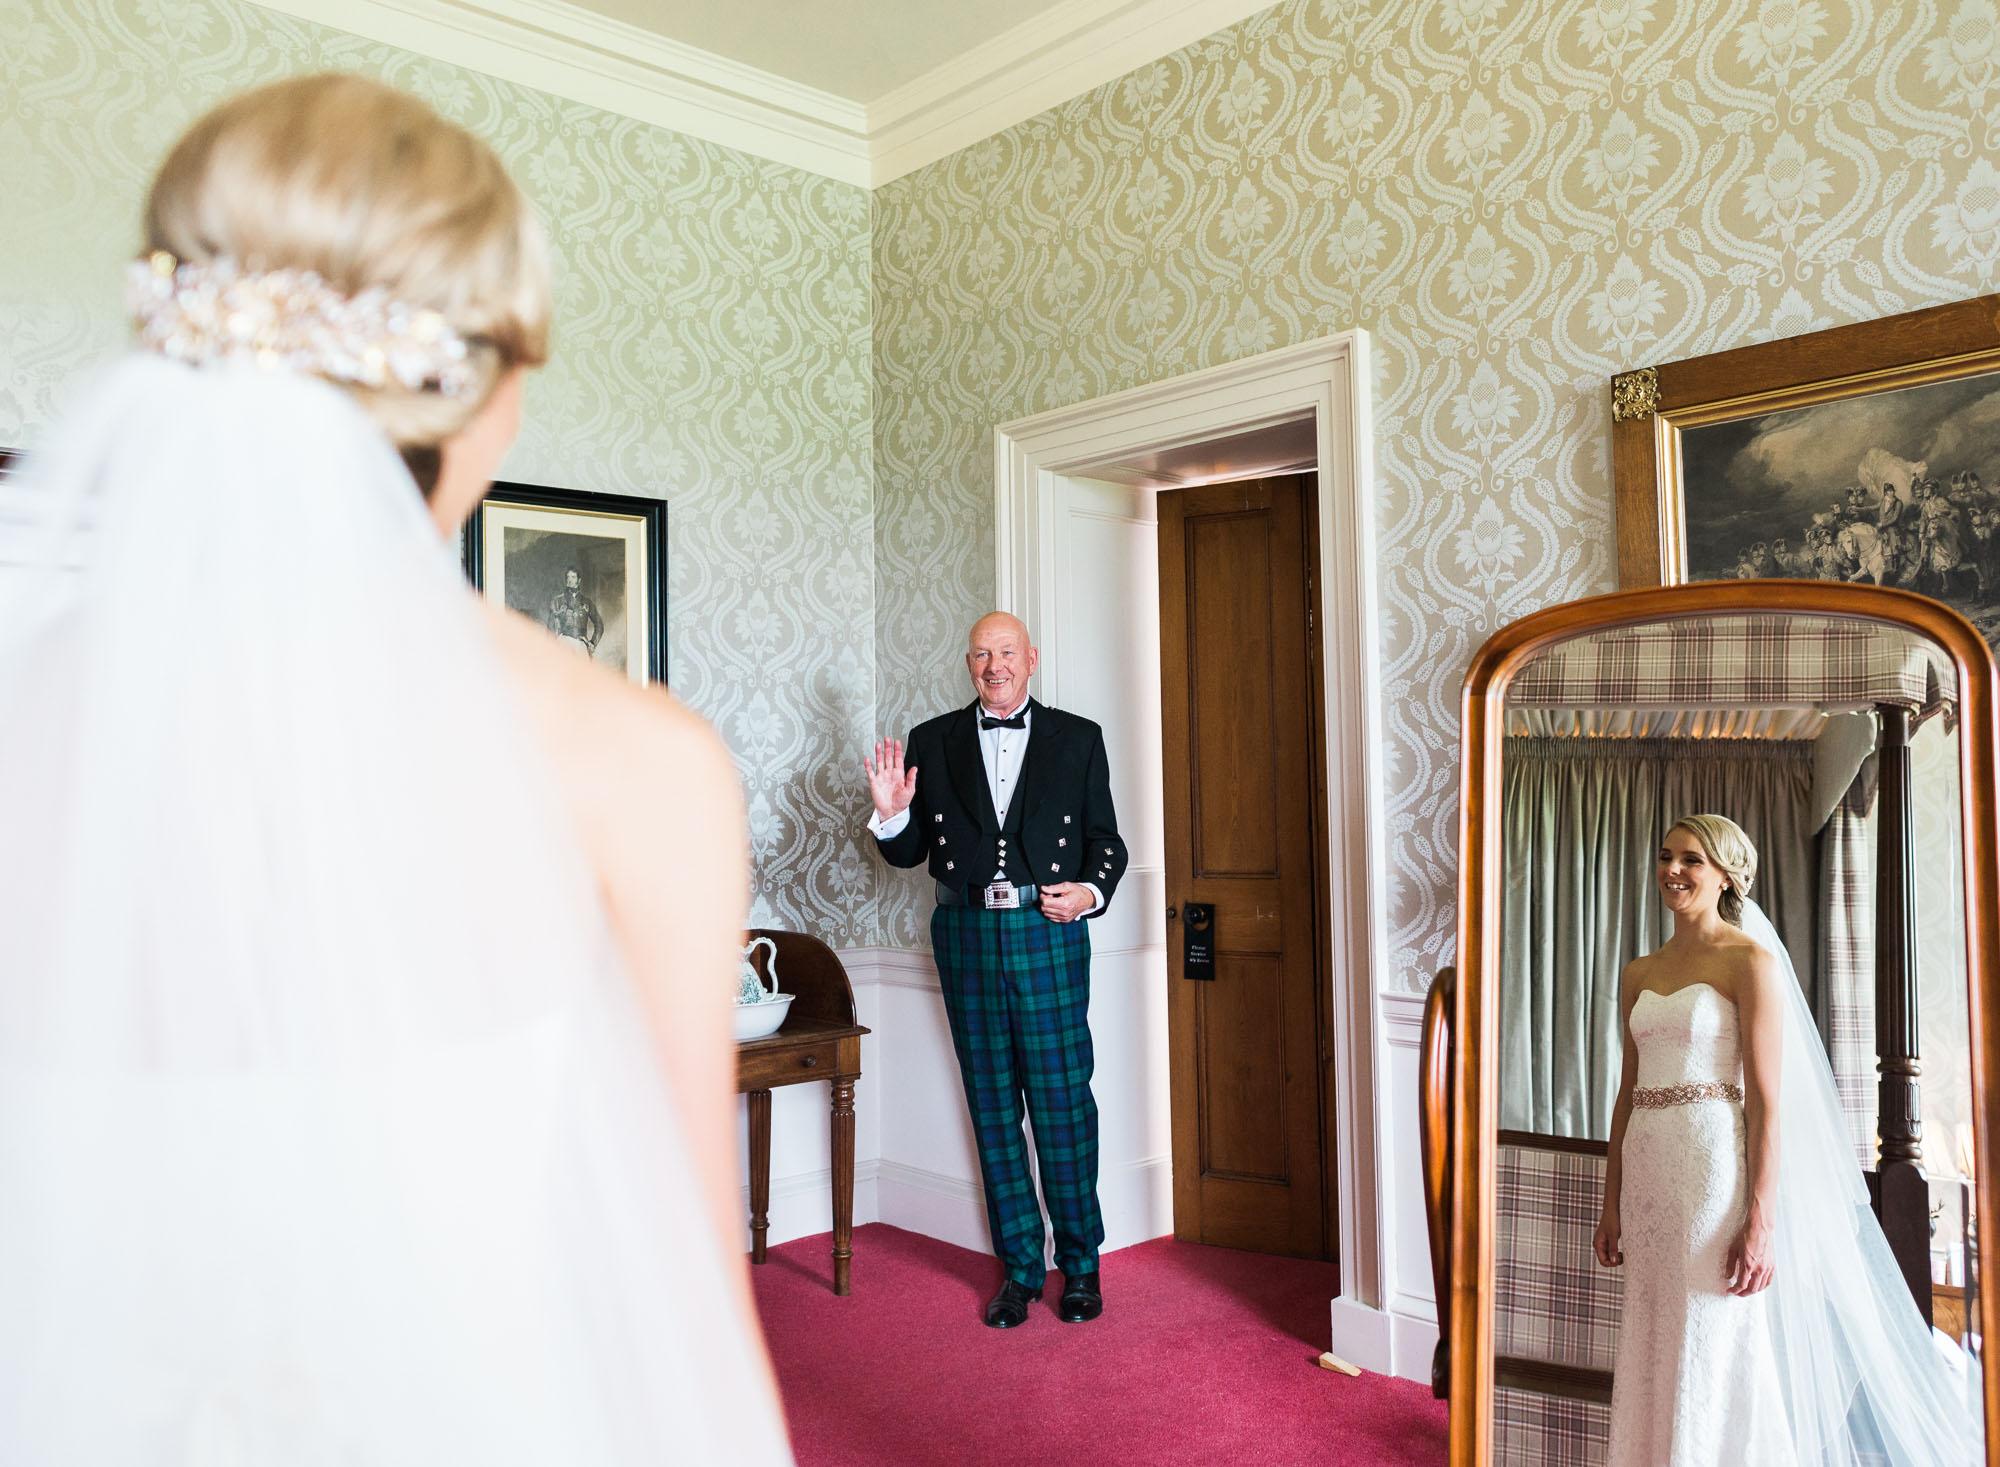 scottish_wedding_blairquhan_castle-59.jpg